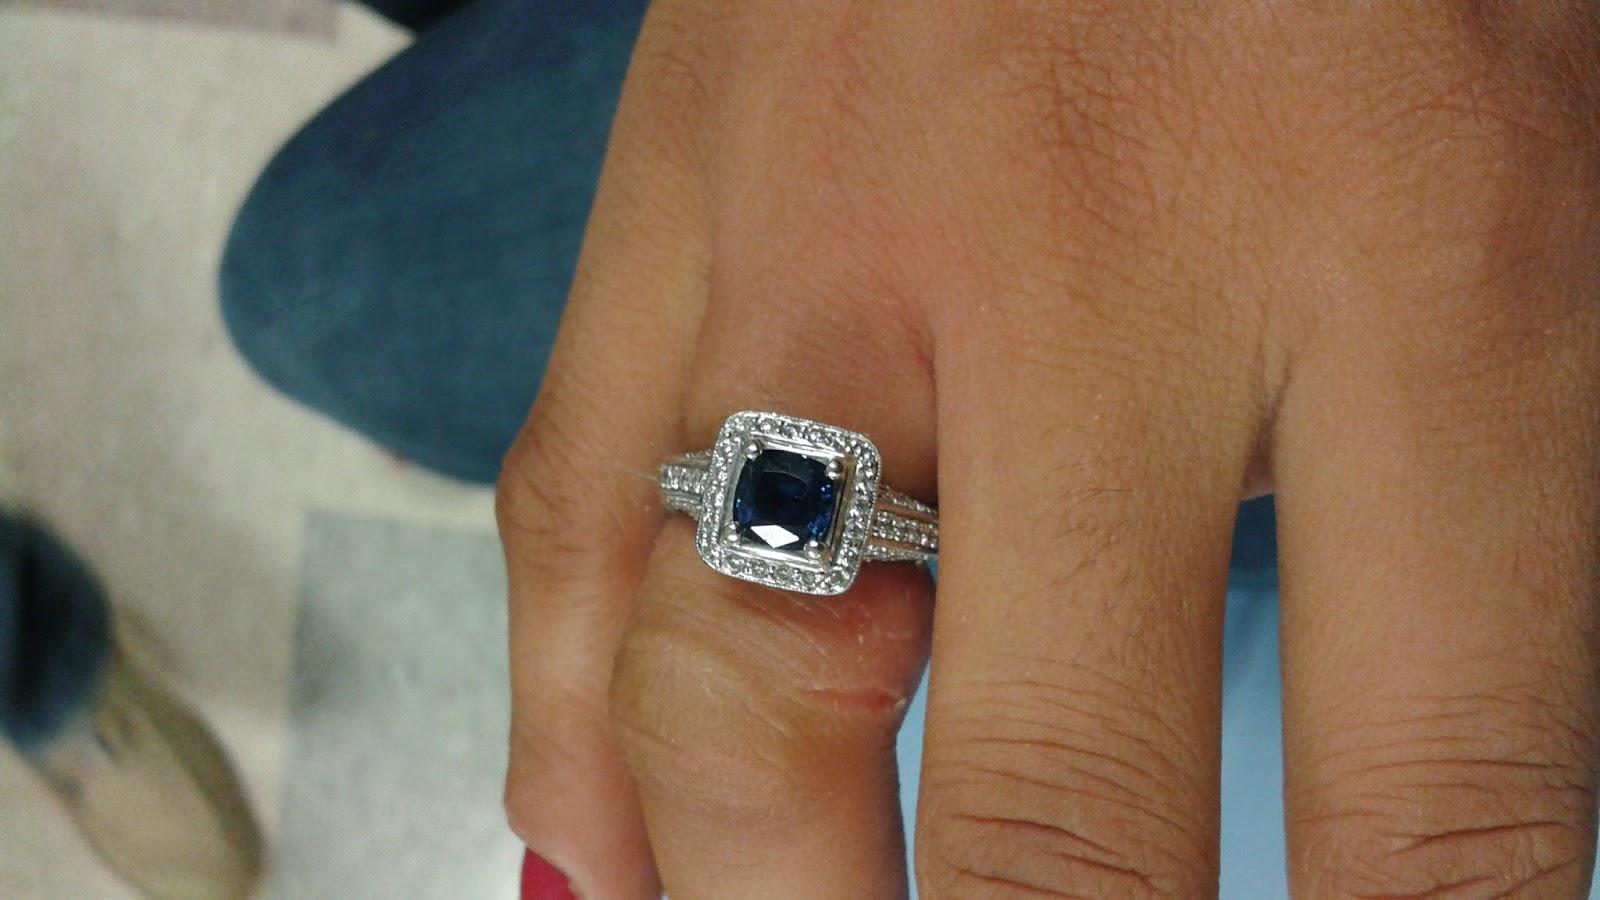 maquina para cortar un anillo de oro blanco de 18 k con perlas blanca y zafiro